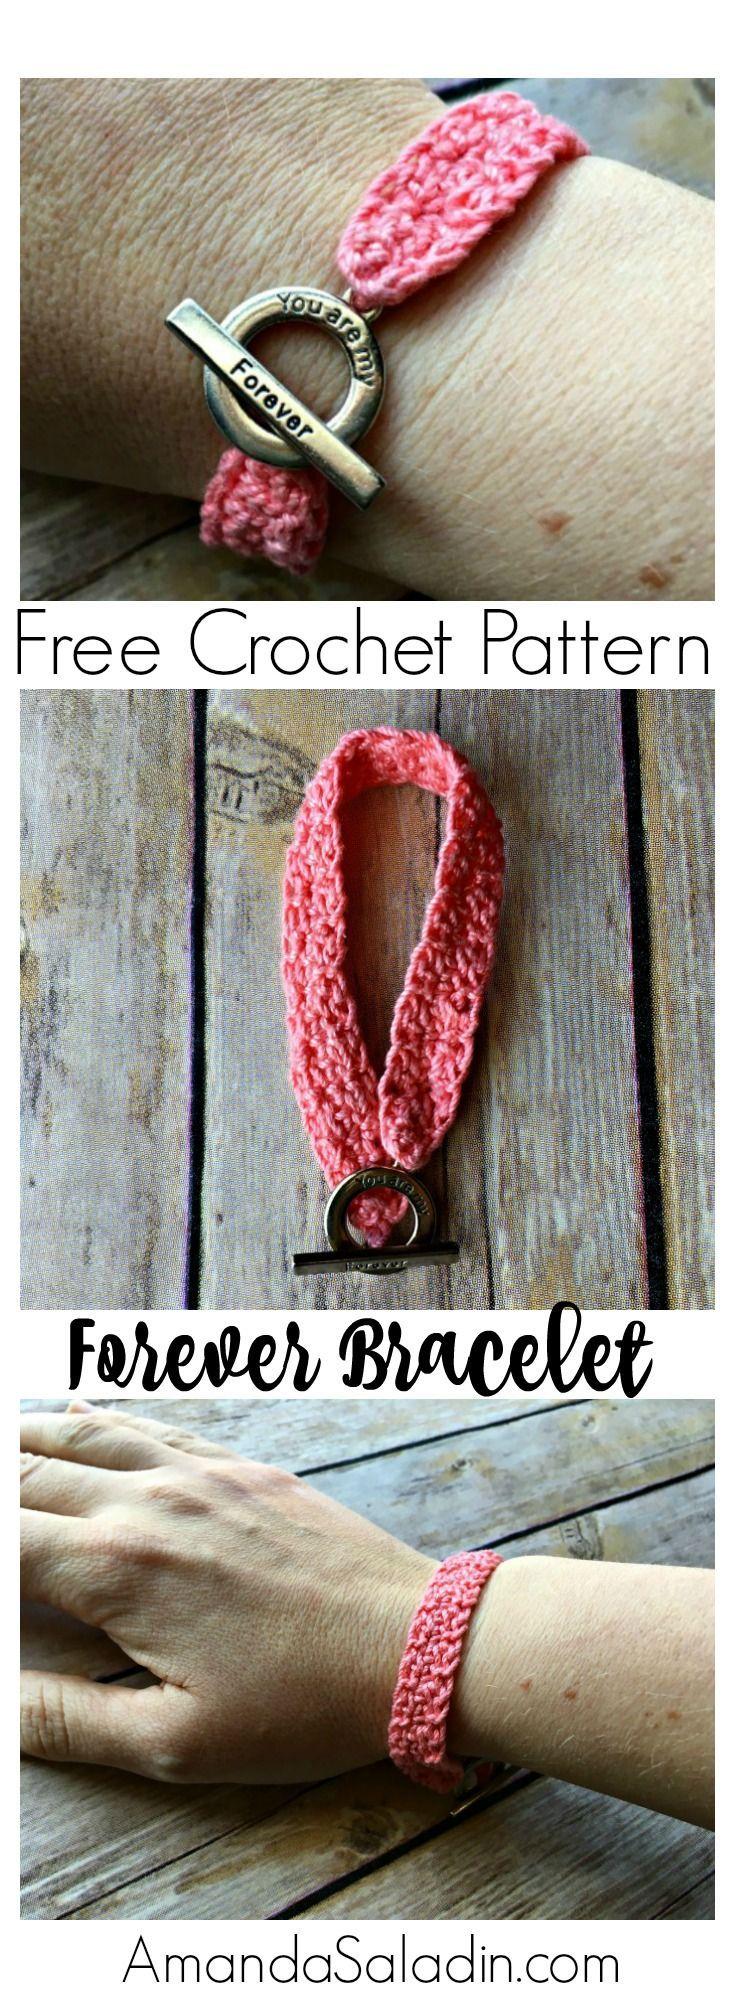 Forever bracelet free crochet pattern free crochet off sale forever bracelet free crochet pattern bankloansurffo Images